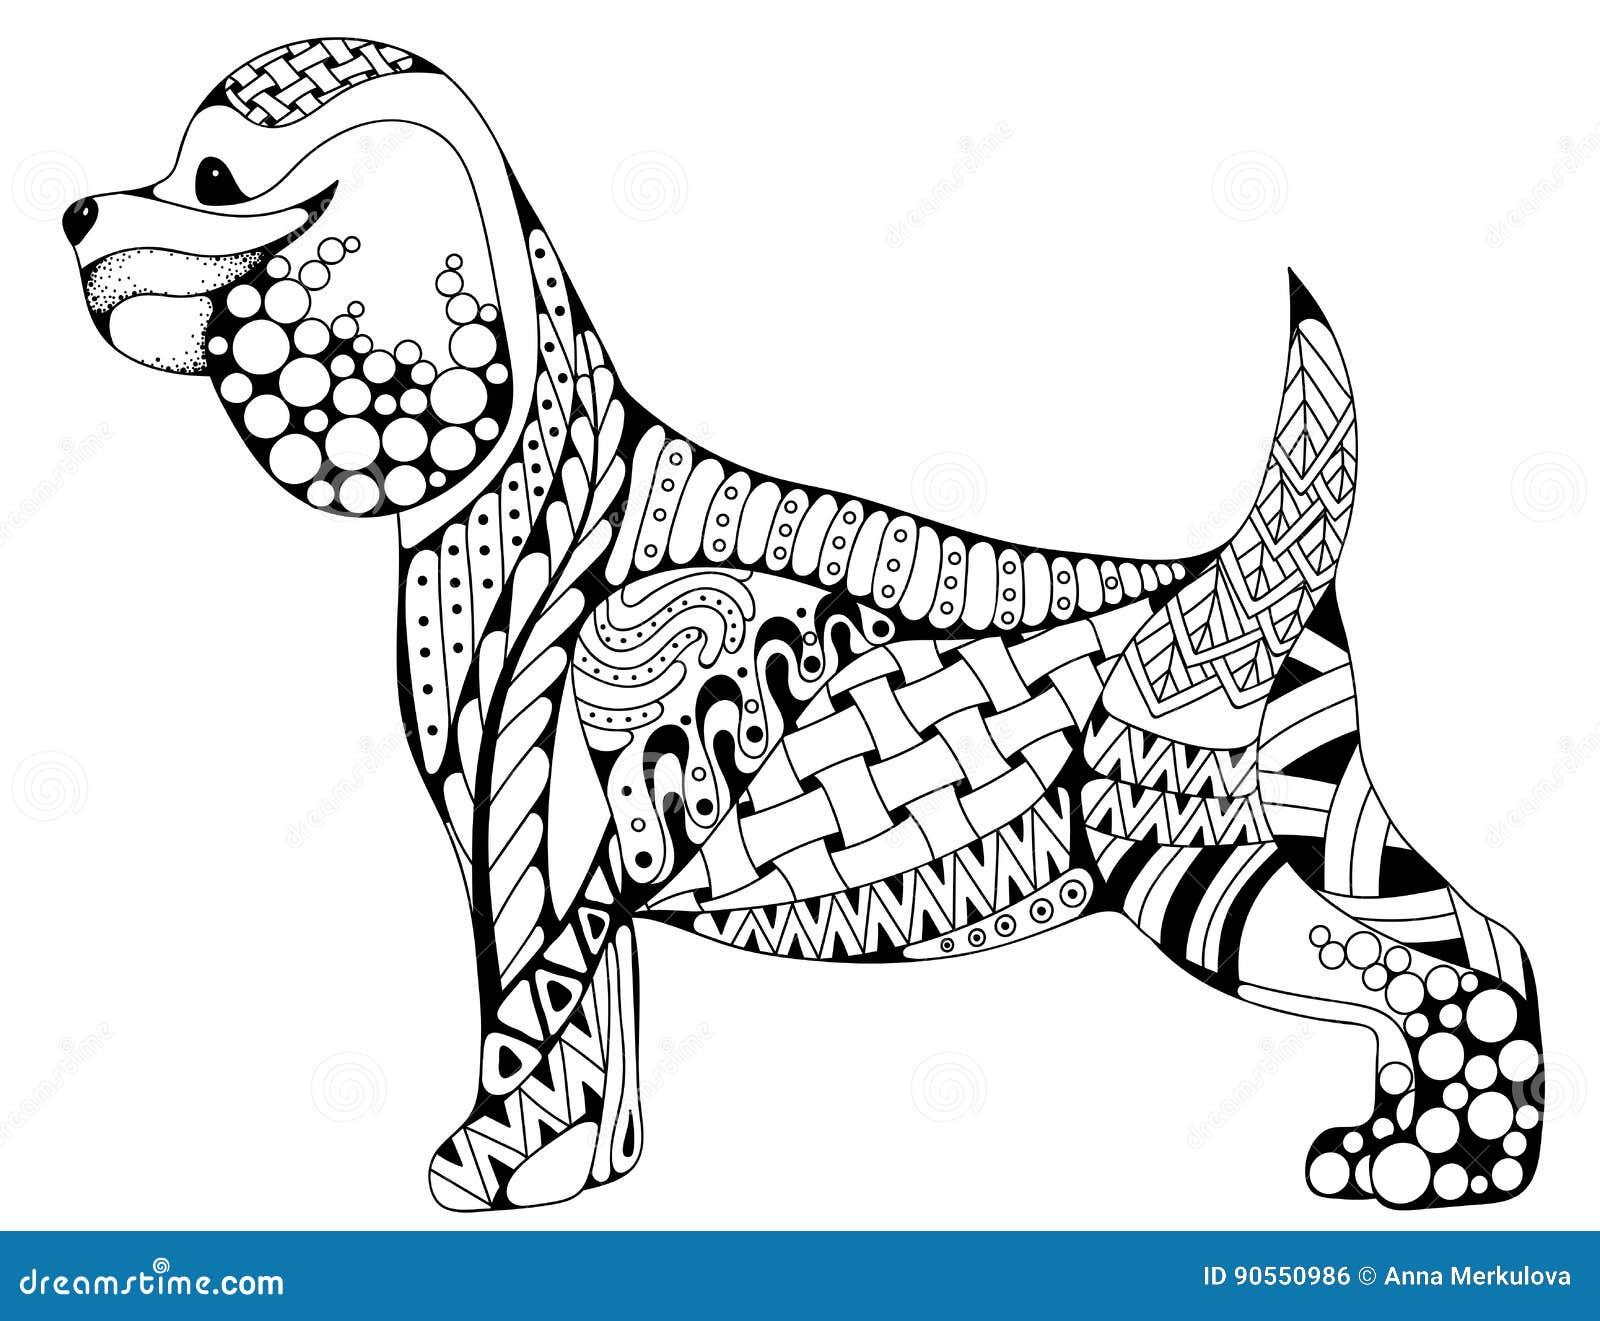 Zentangle Stylized Cartoon Cocker Spaniel Dog, Isolated On ...